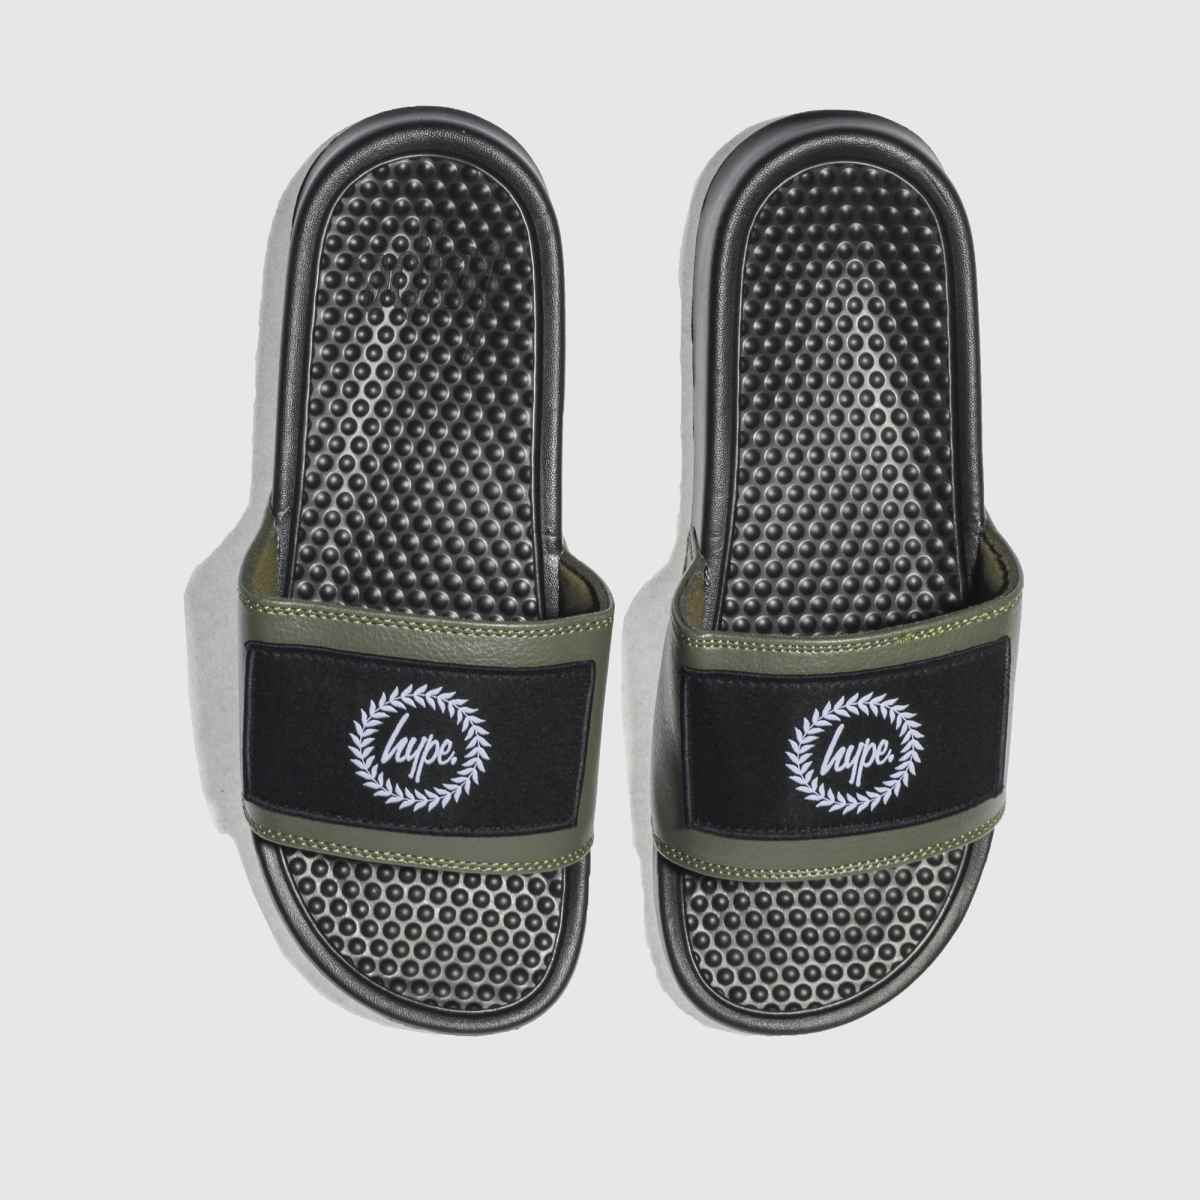 Hype Hype Khaki Insignia Slider Sandals